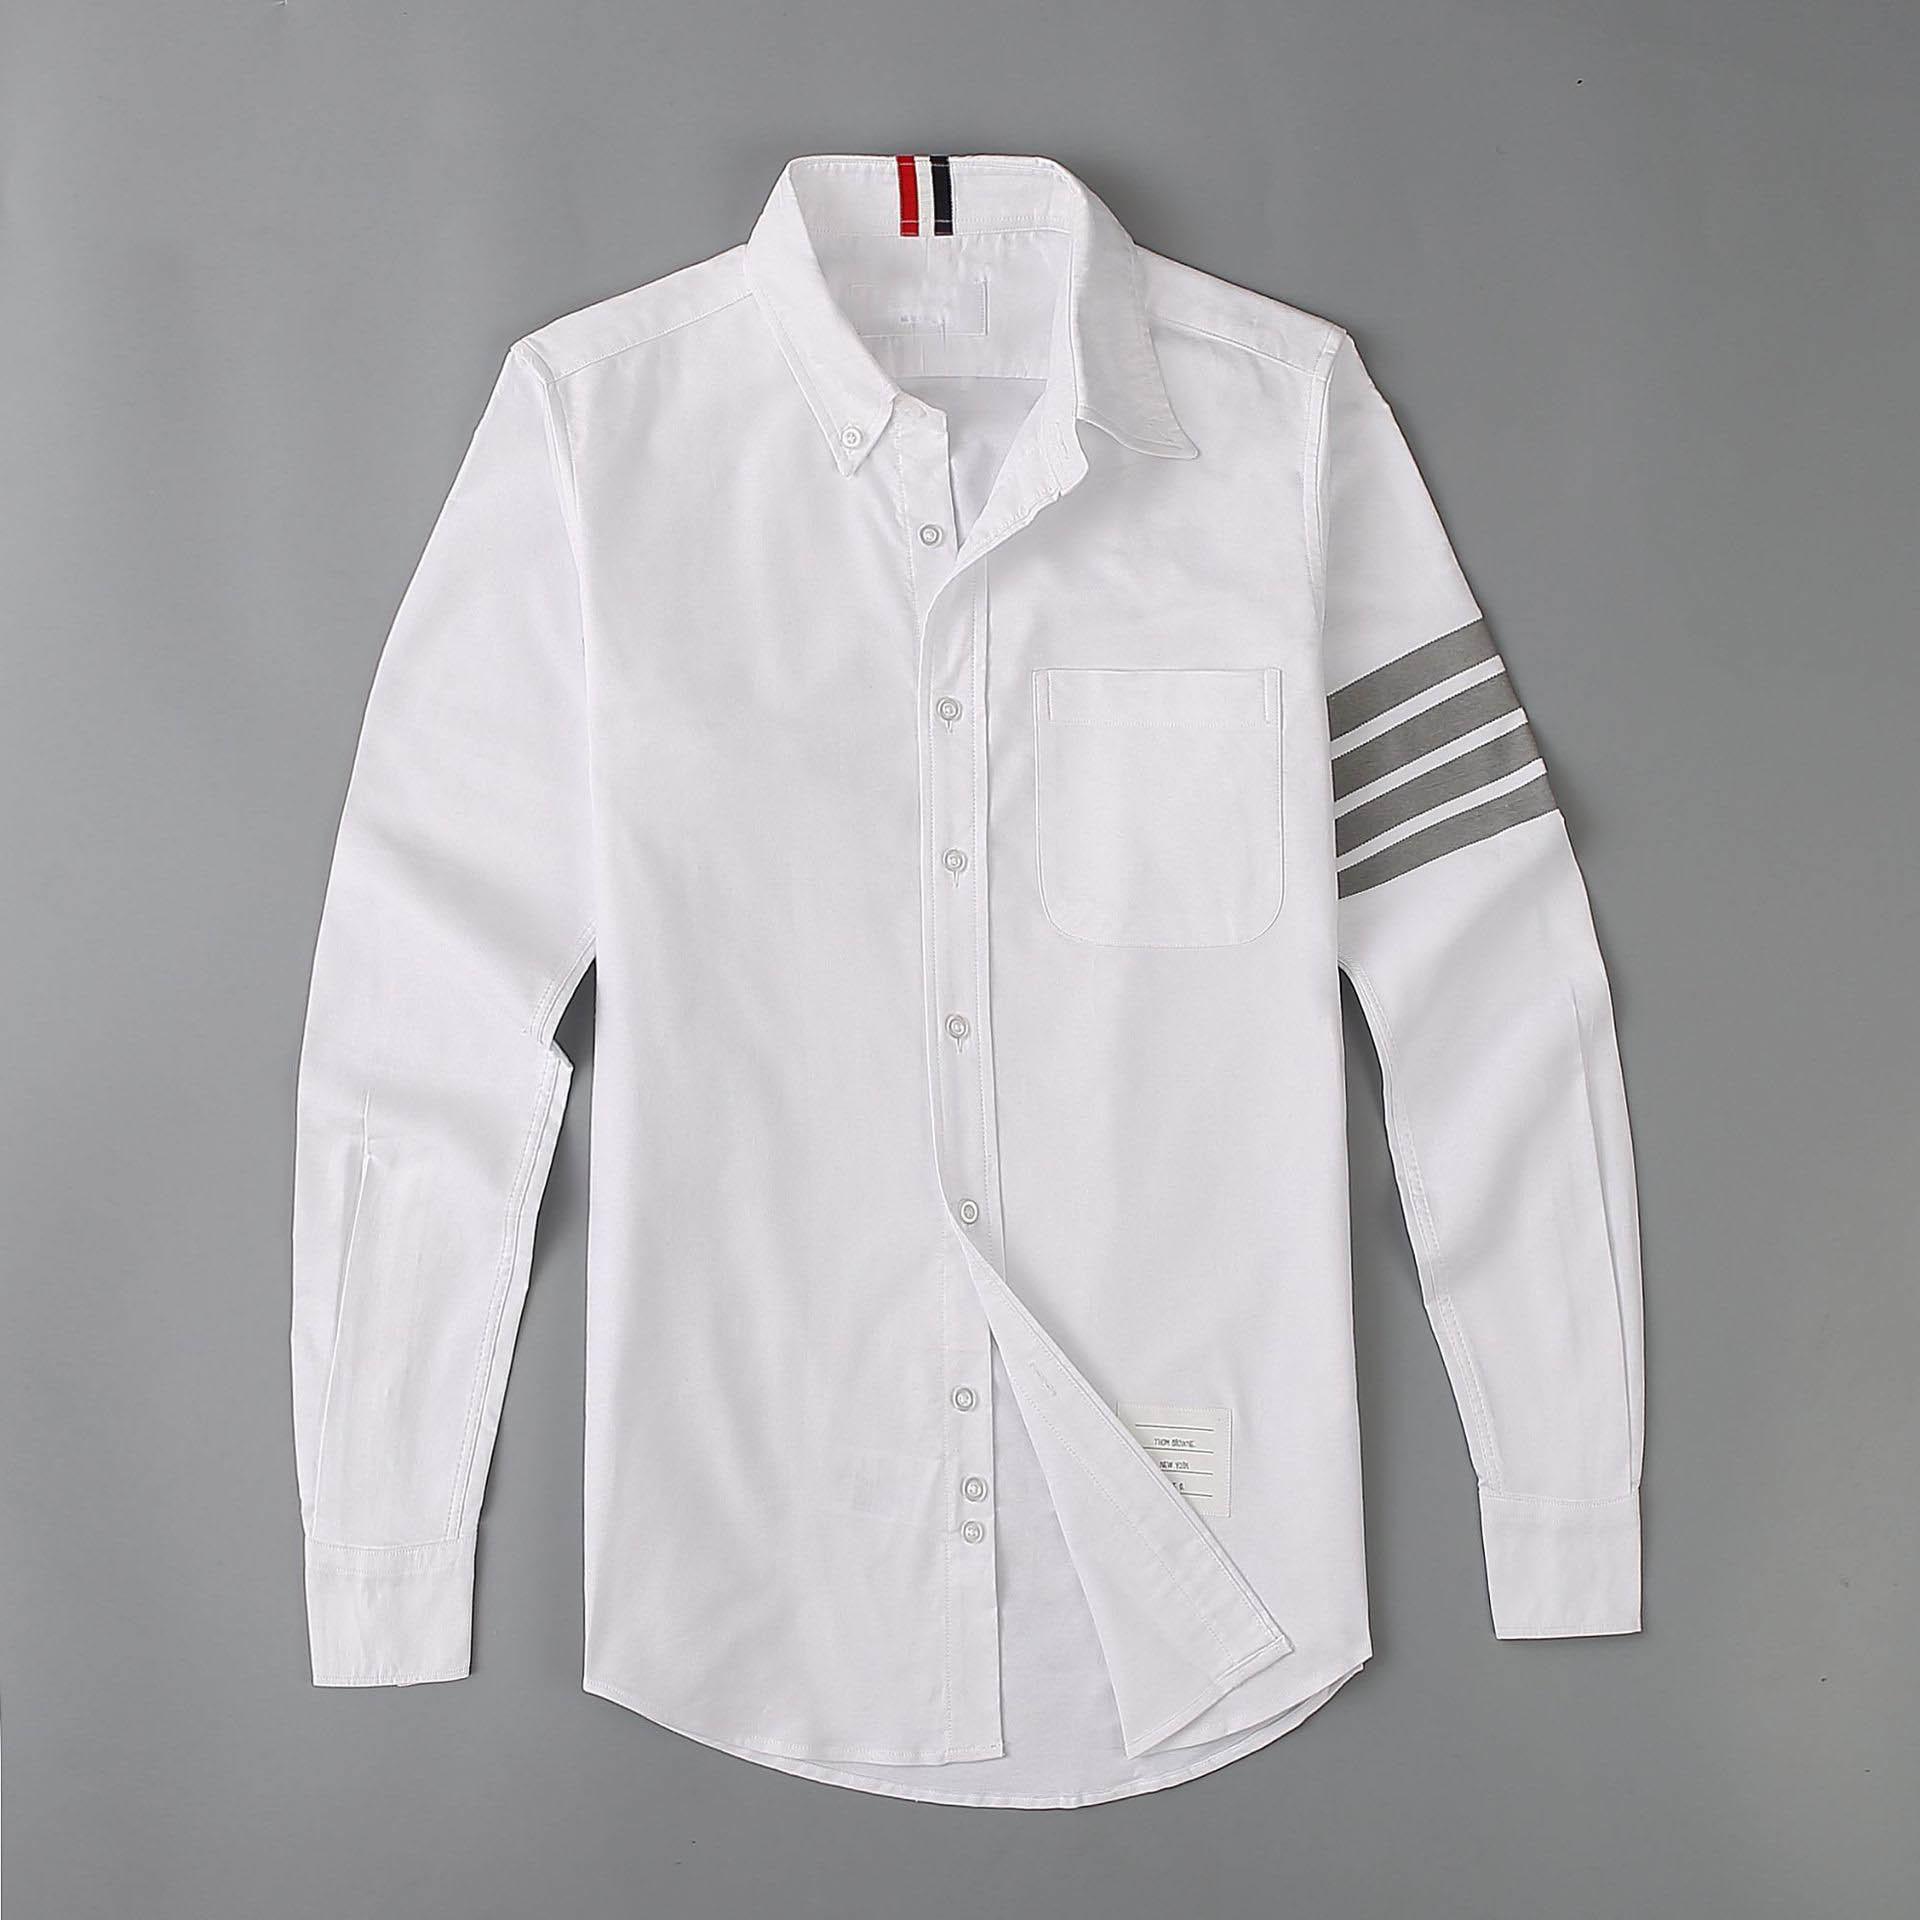 New 19ss Men Oxford Classic Grey stripe Fashion Cotton Casual Shirts Shirt high quality Pocket long-sleeves Top M 2XL #M49 C1215